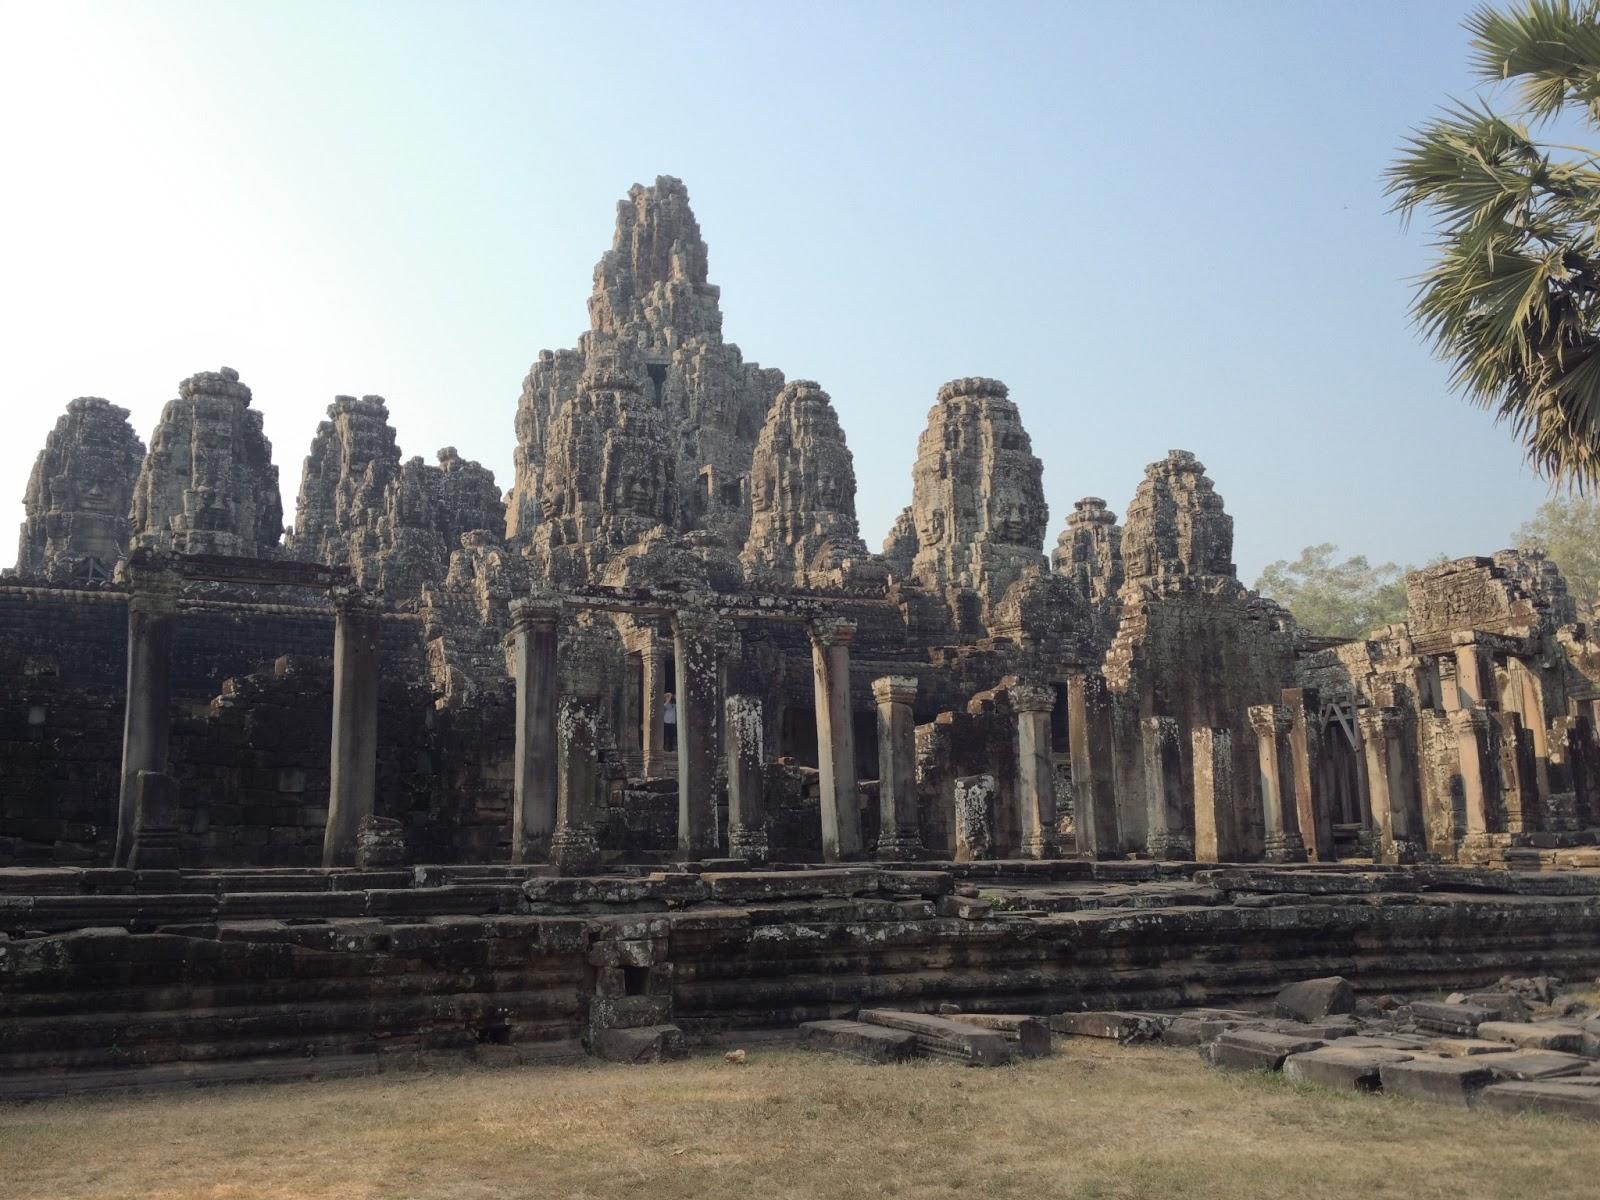 Khmer Empire Architecture Khmer Architecture